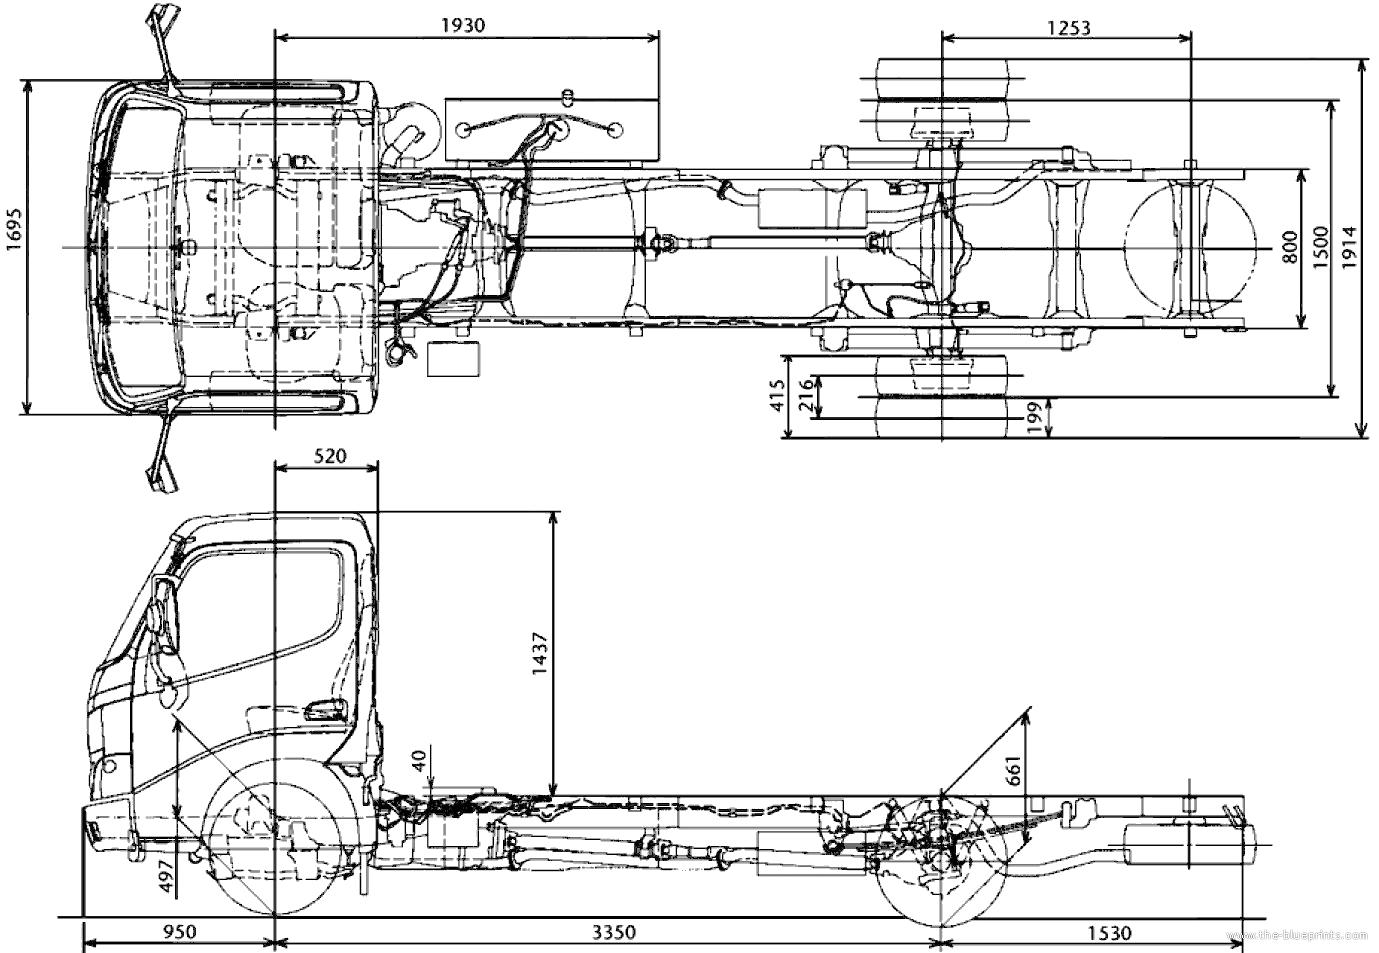 Blueprints Gt Trucks Gt Toyota Gt Toyota Dyna 150xl